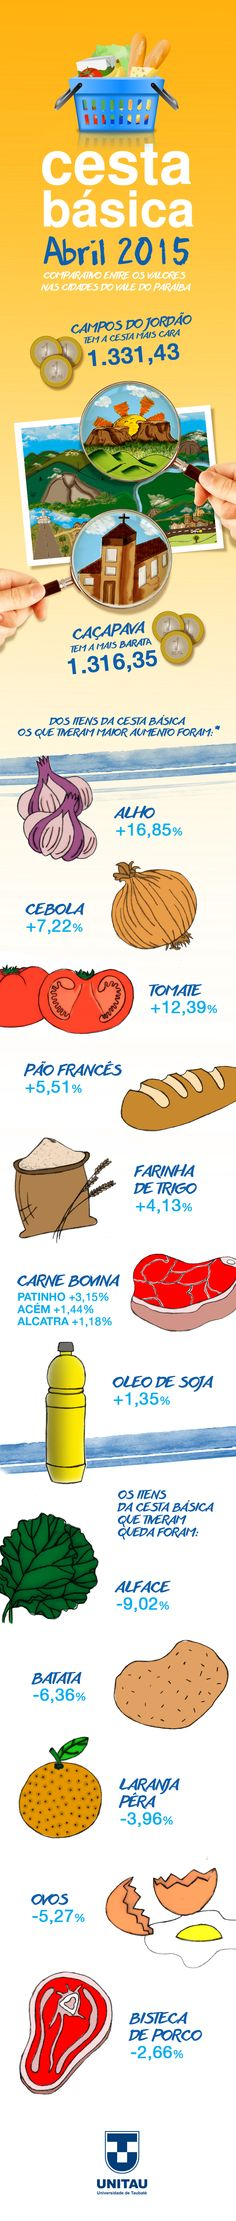 Os valores das cestas básicas nas cidades do Vale do Paraíba.